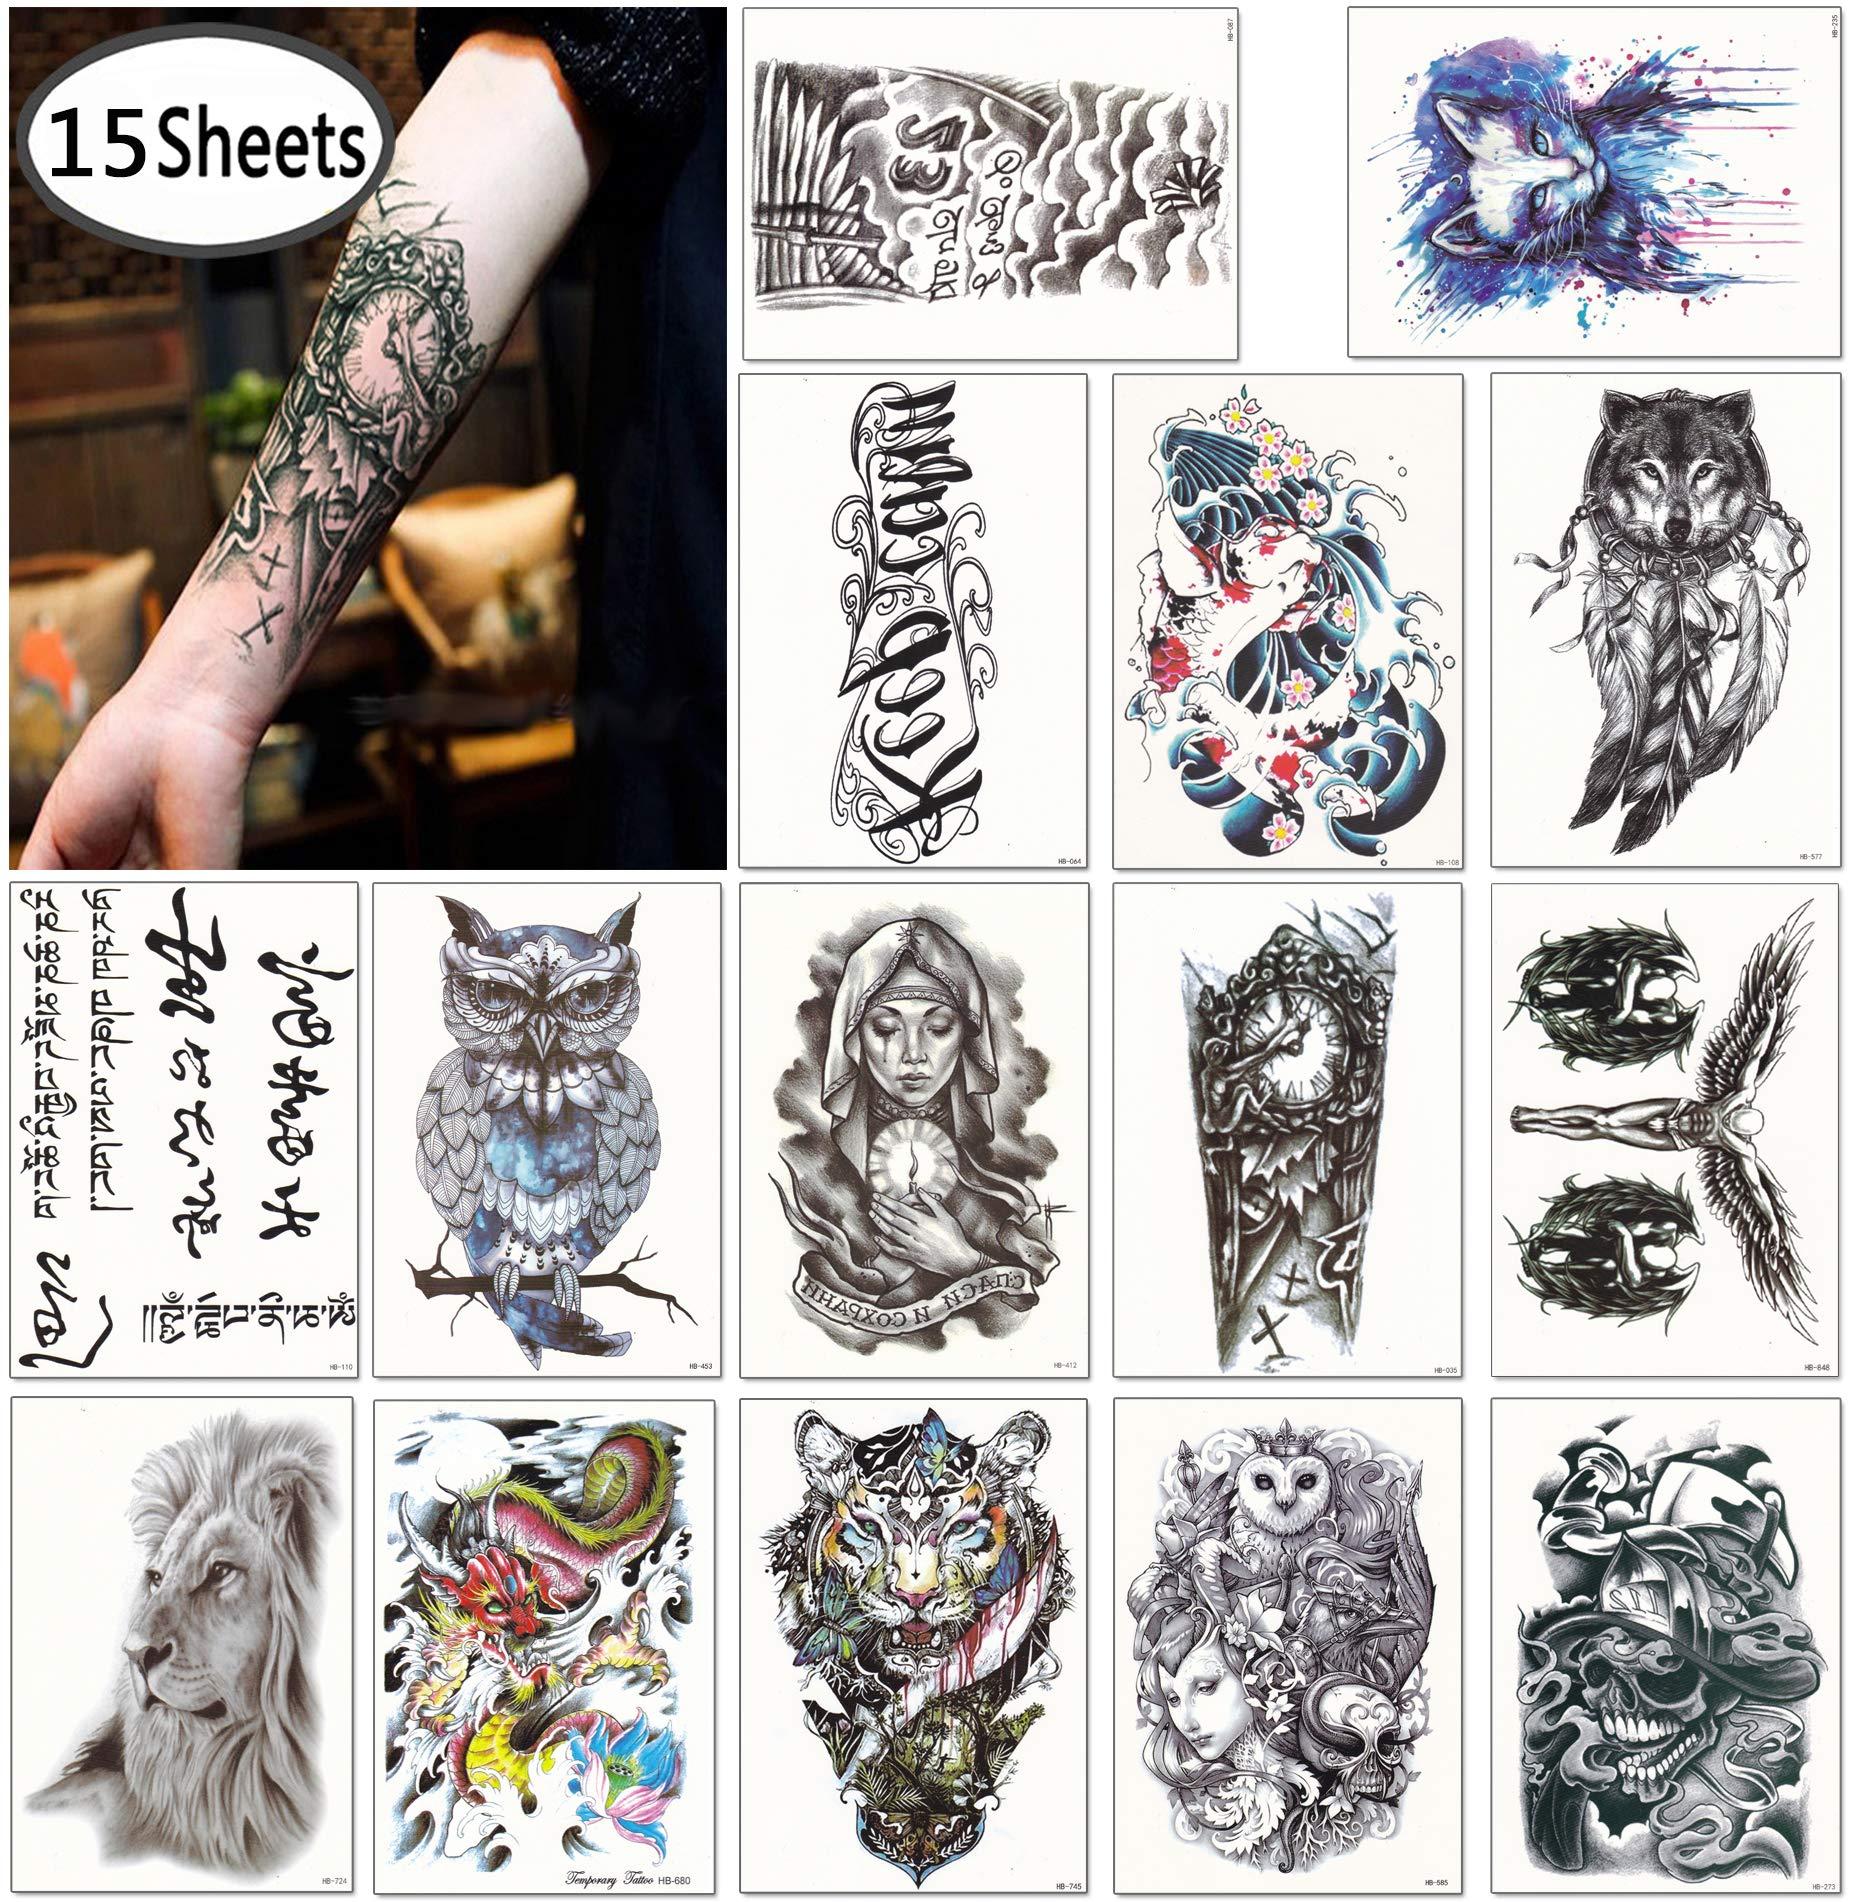 8fd57c78a Amazon.com : DaLin Large Temporary Tattoos Half Arm Tattoo Sleeves 15  Sheets, Robot Arm, Dead Skull, Koi Fish, Lion, Owl, Dragon, Tiger and more  : Beauty